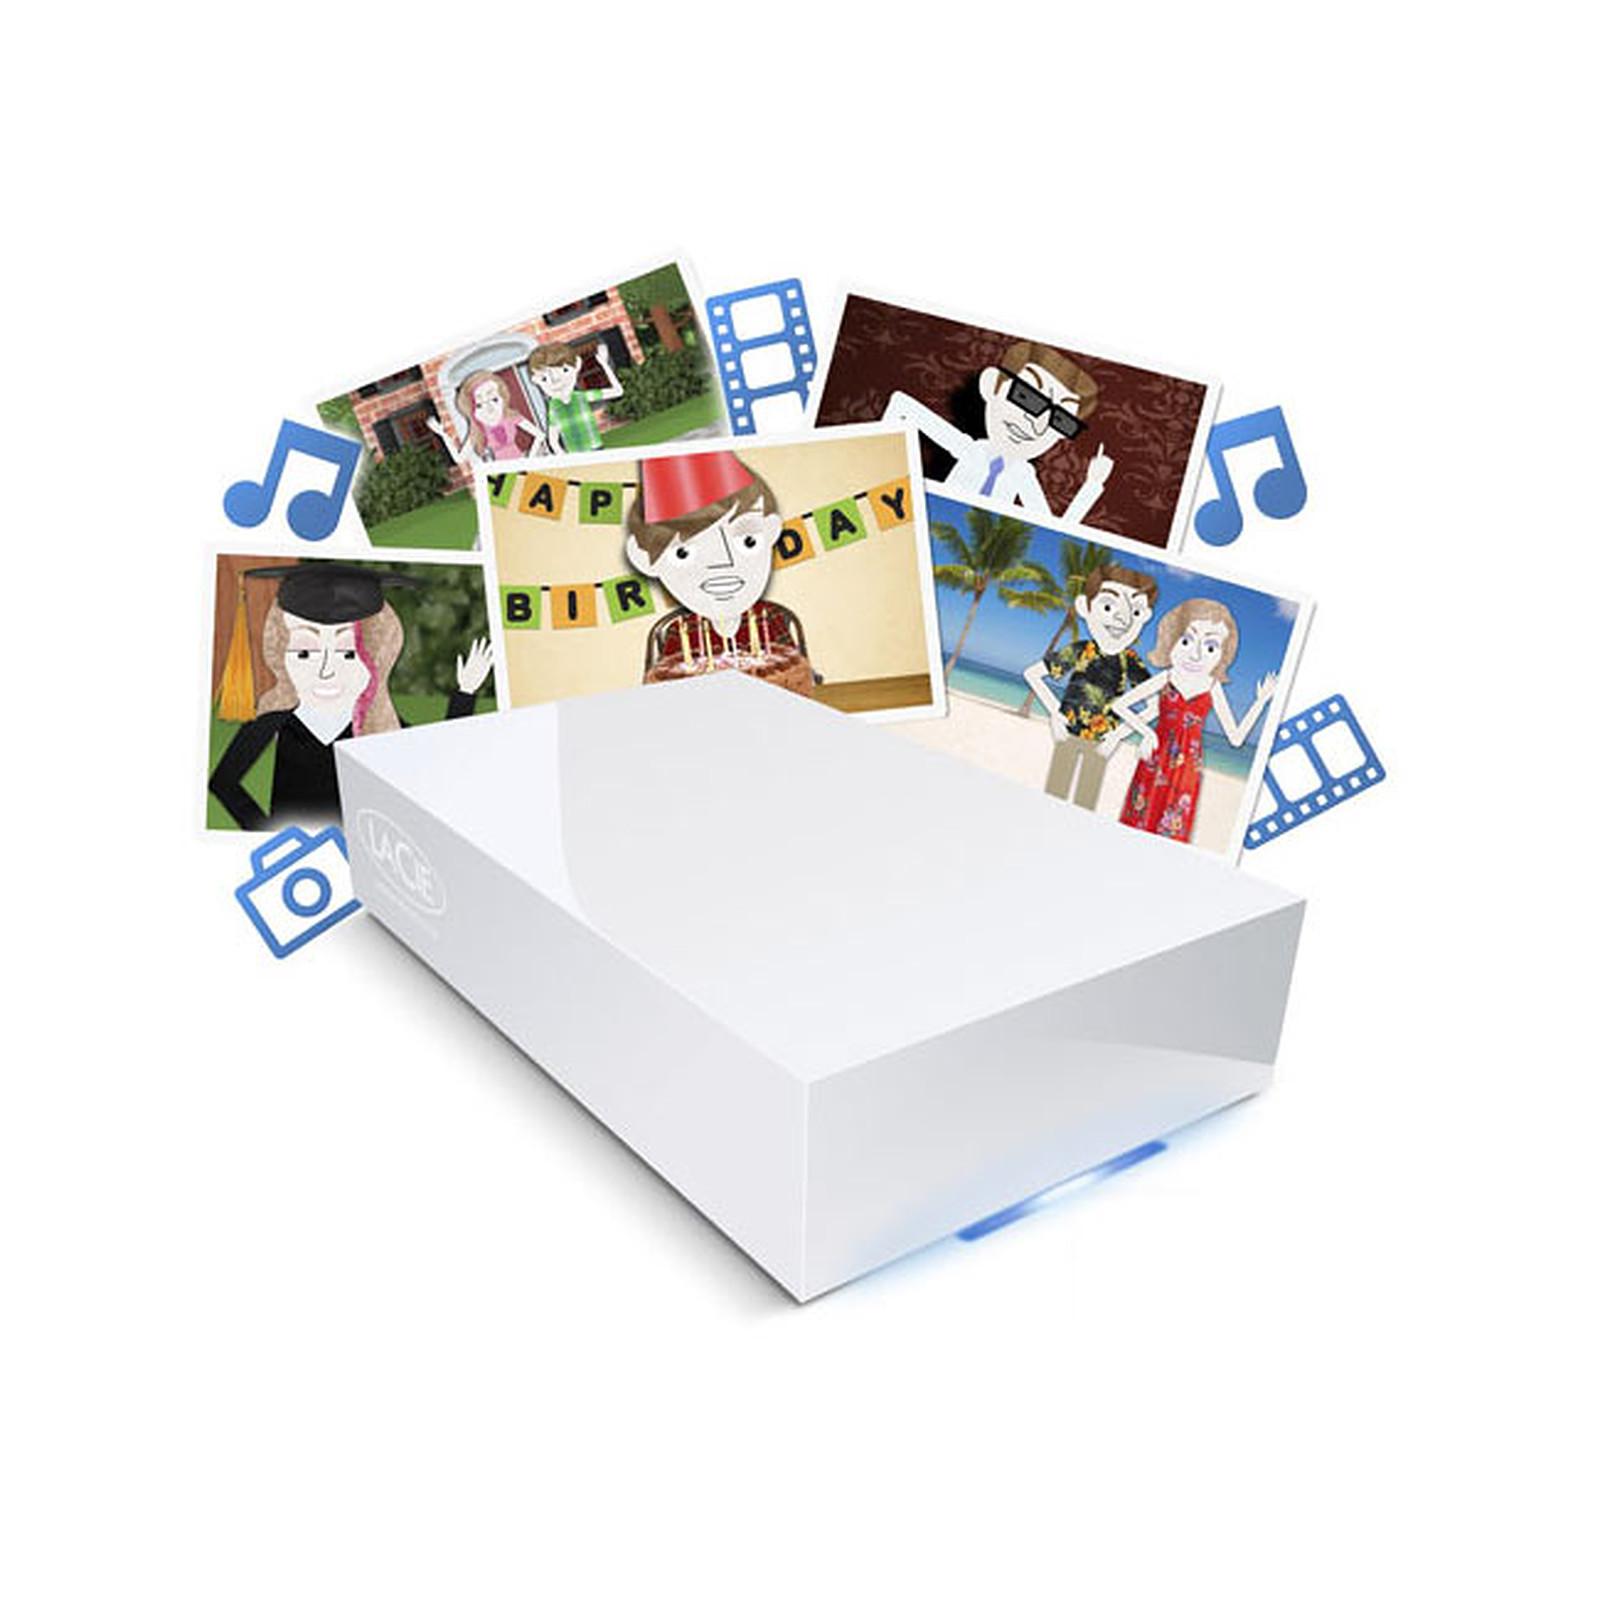 LaCie CloudBox 3 To